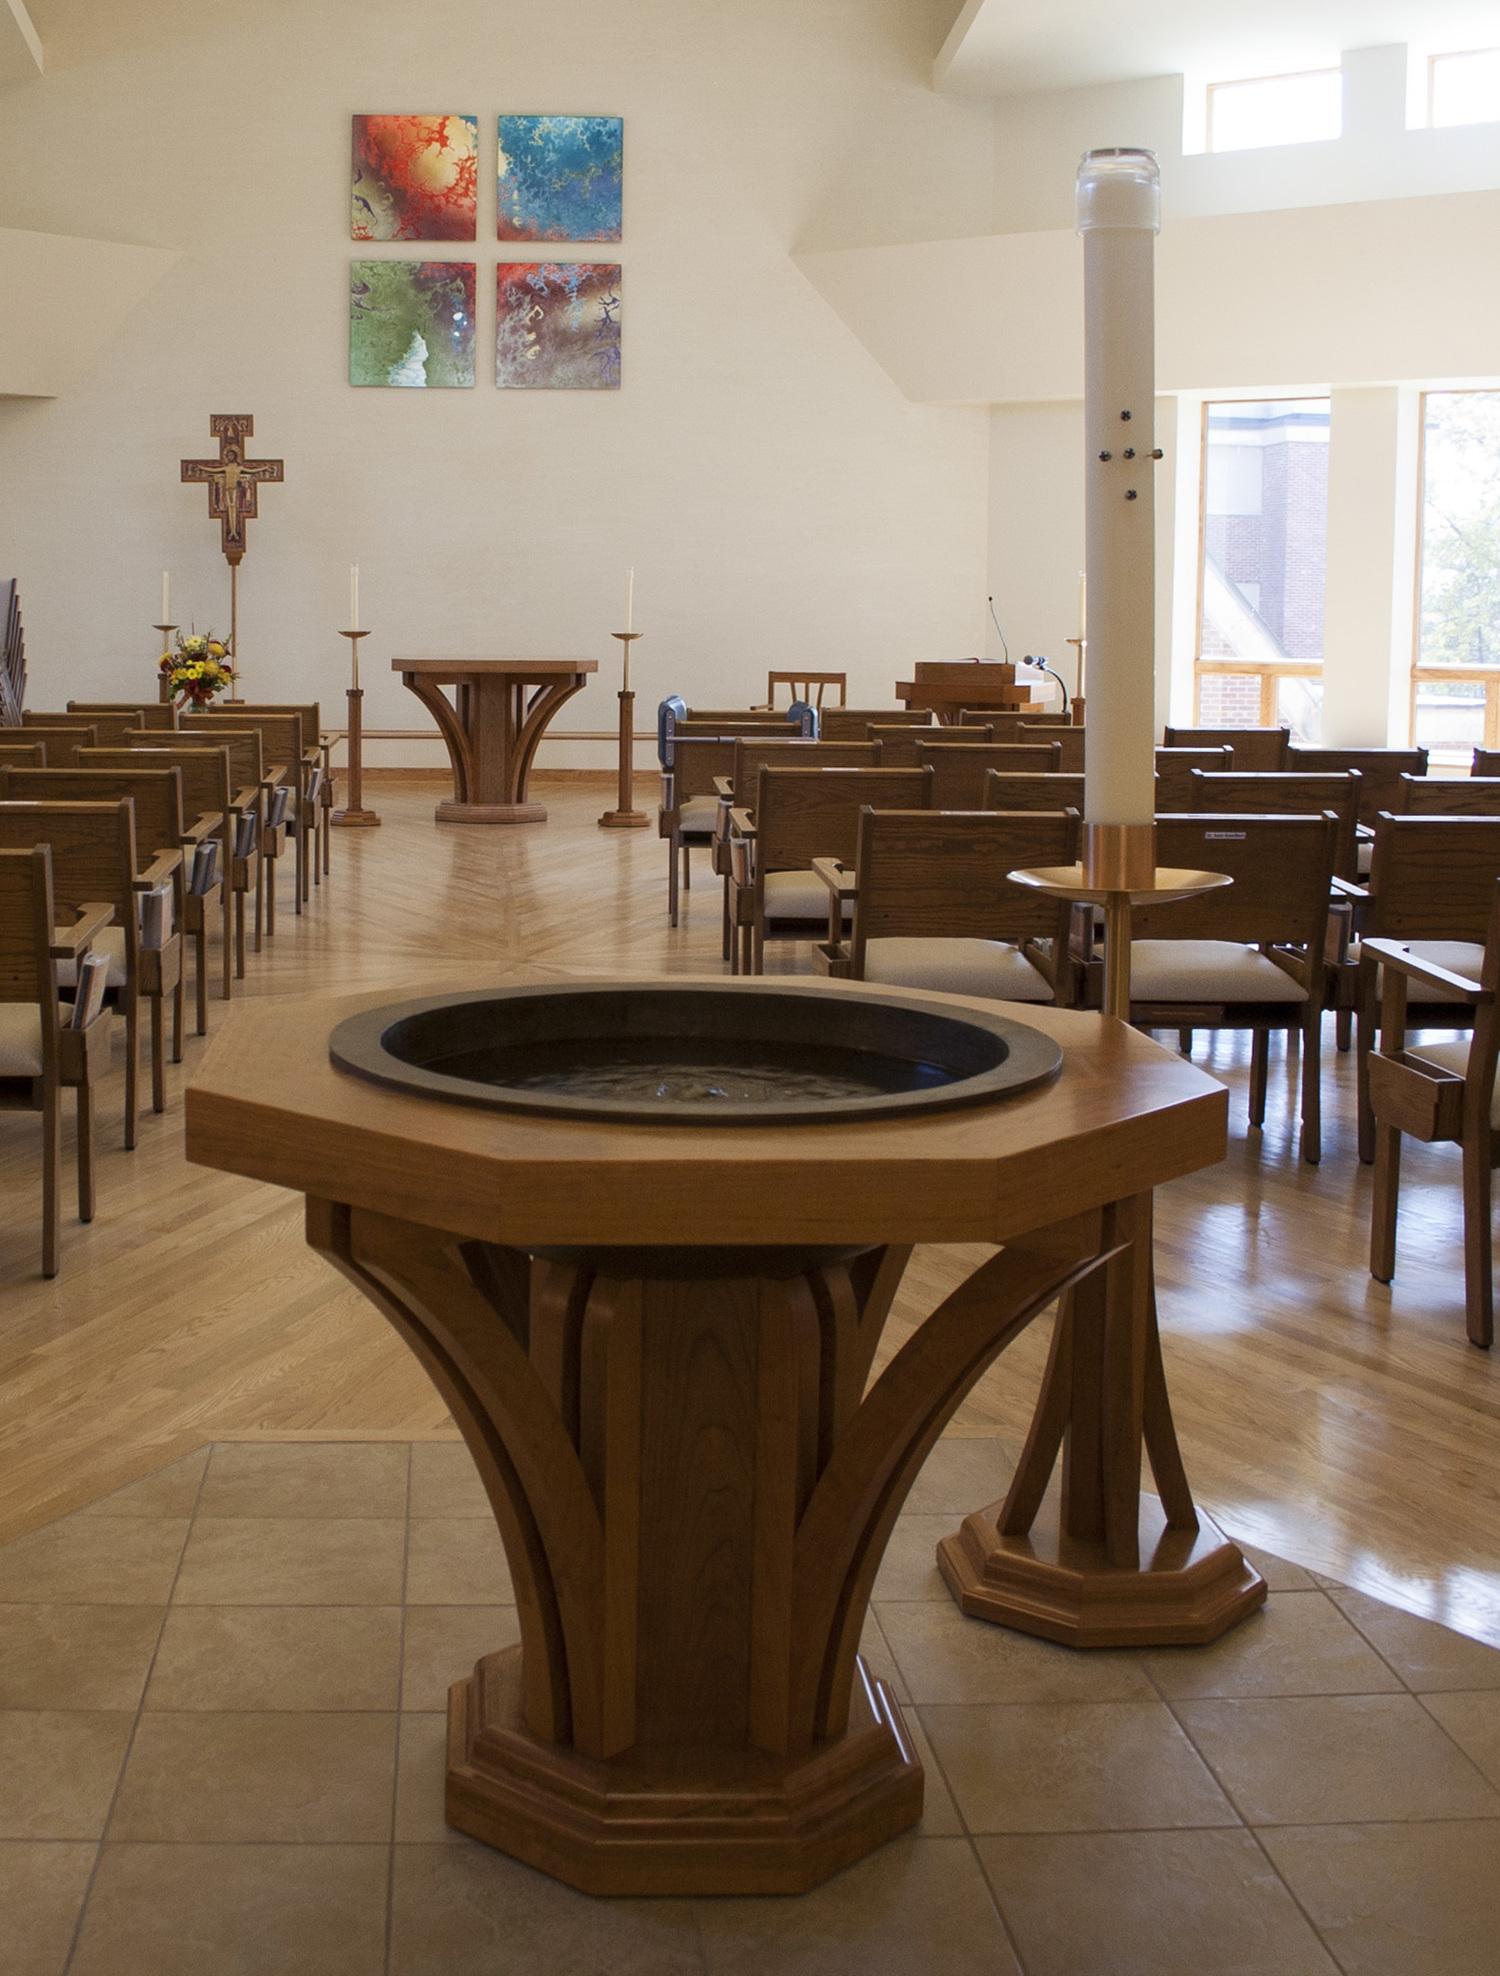 bronze-baptismal-bowl-by-wanner-studios-2